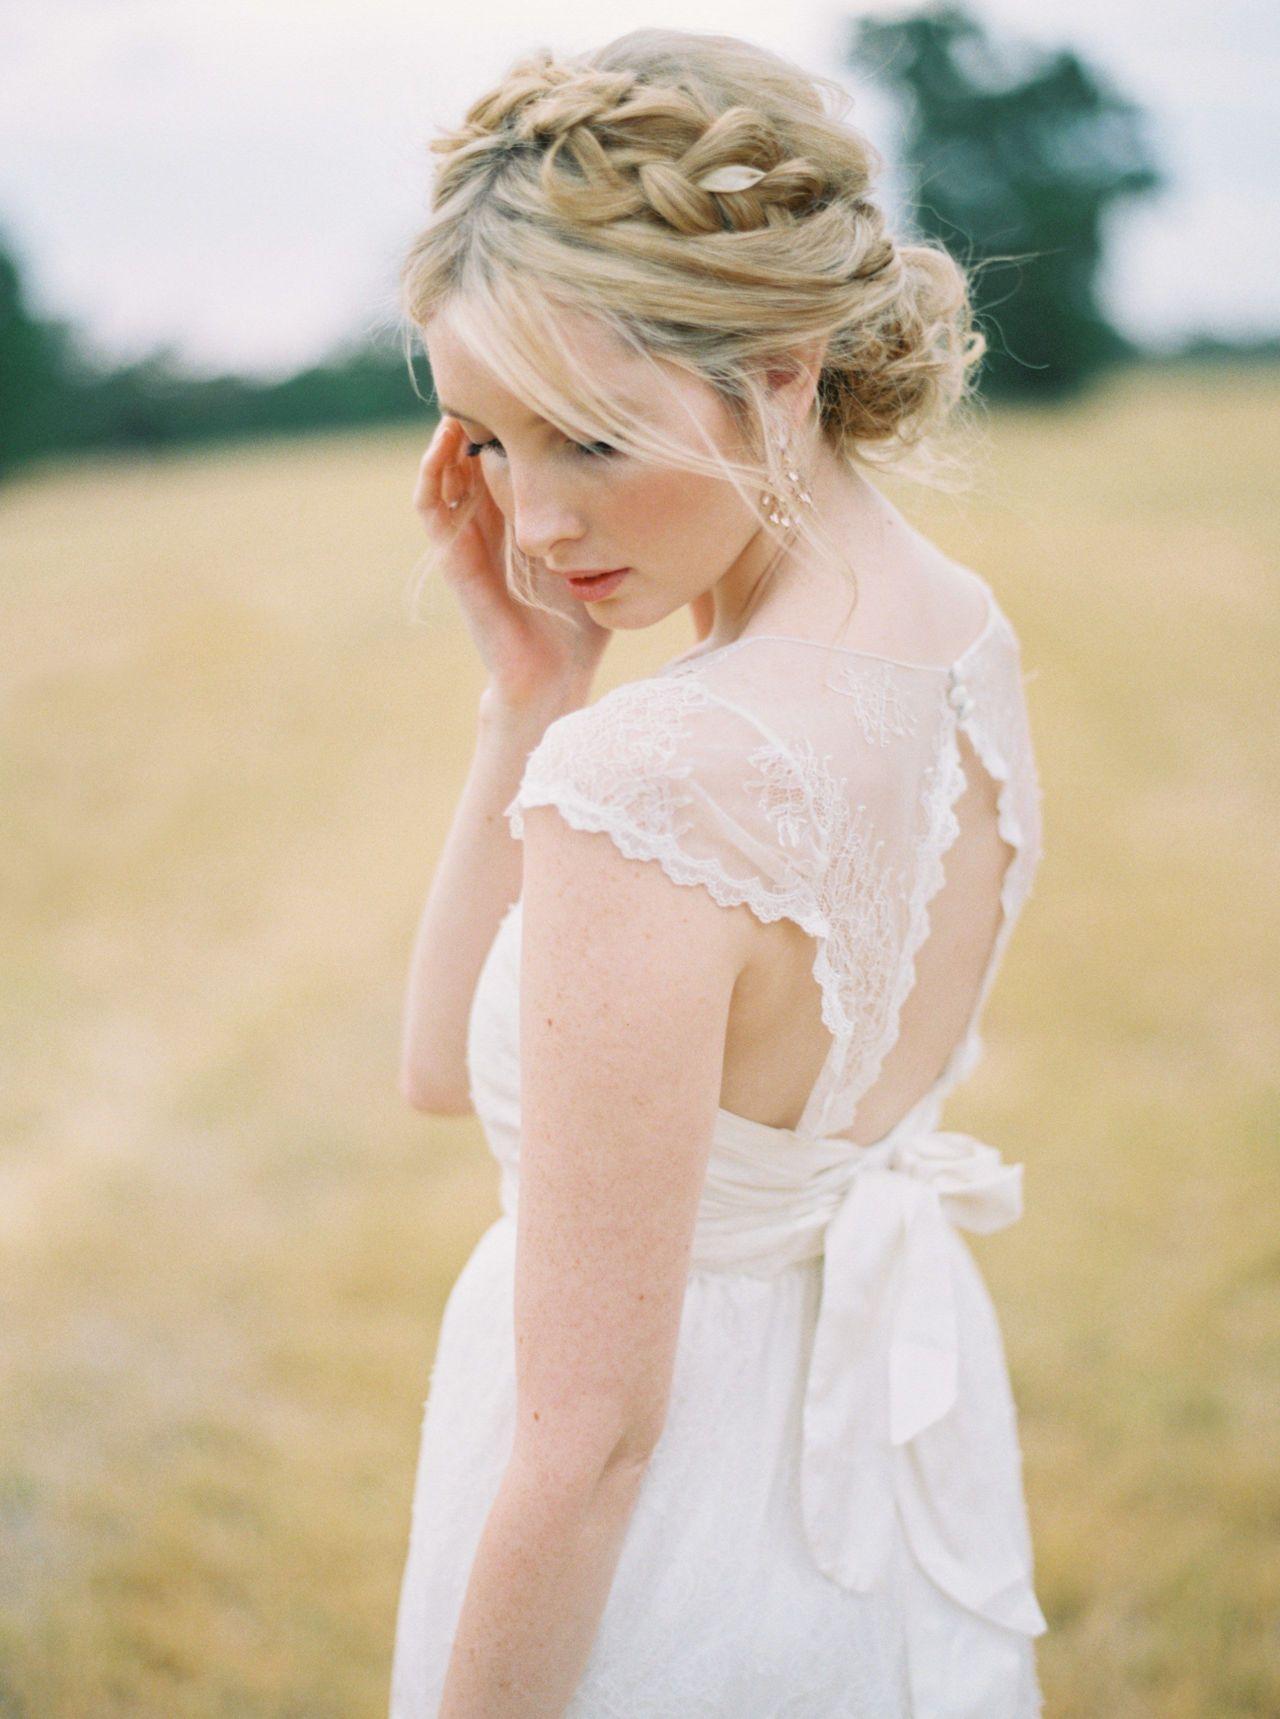 9 Free Spirited Ways to Be a Gorgeous Bohemian Bride